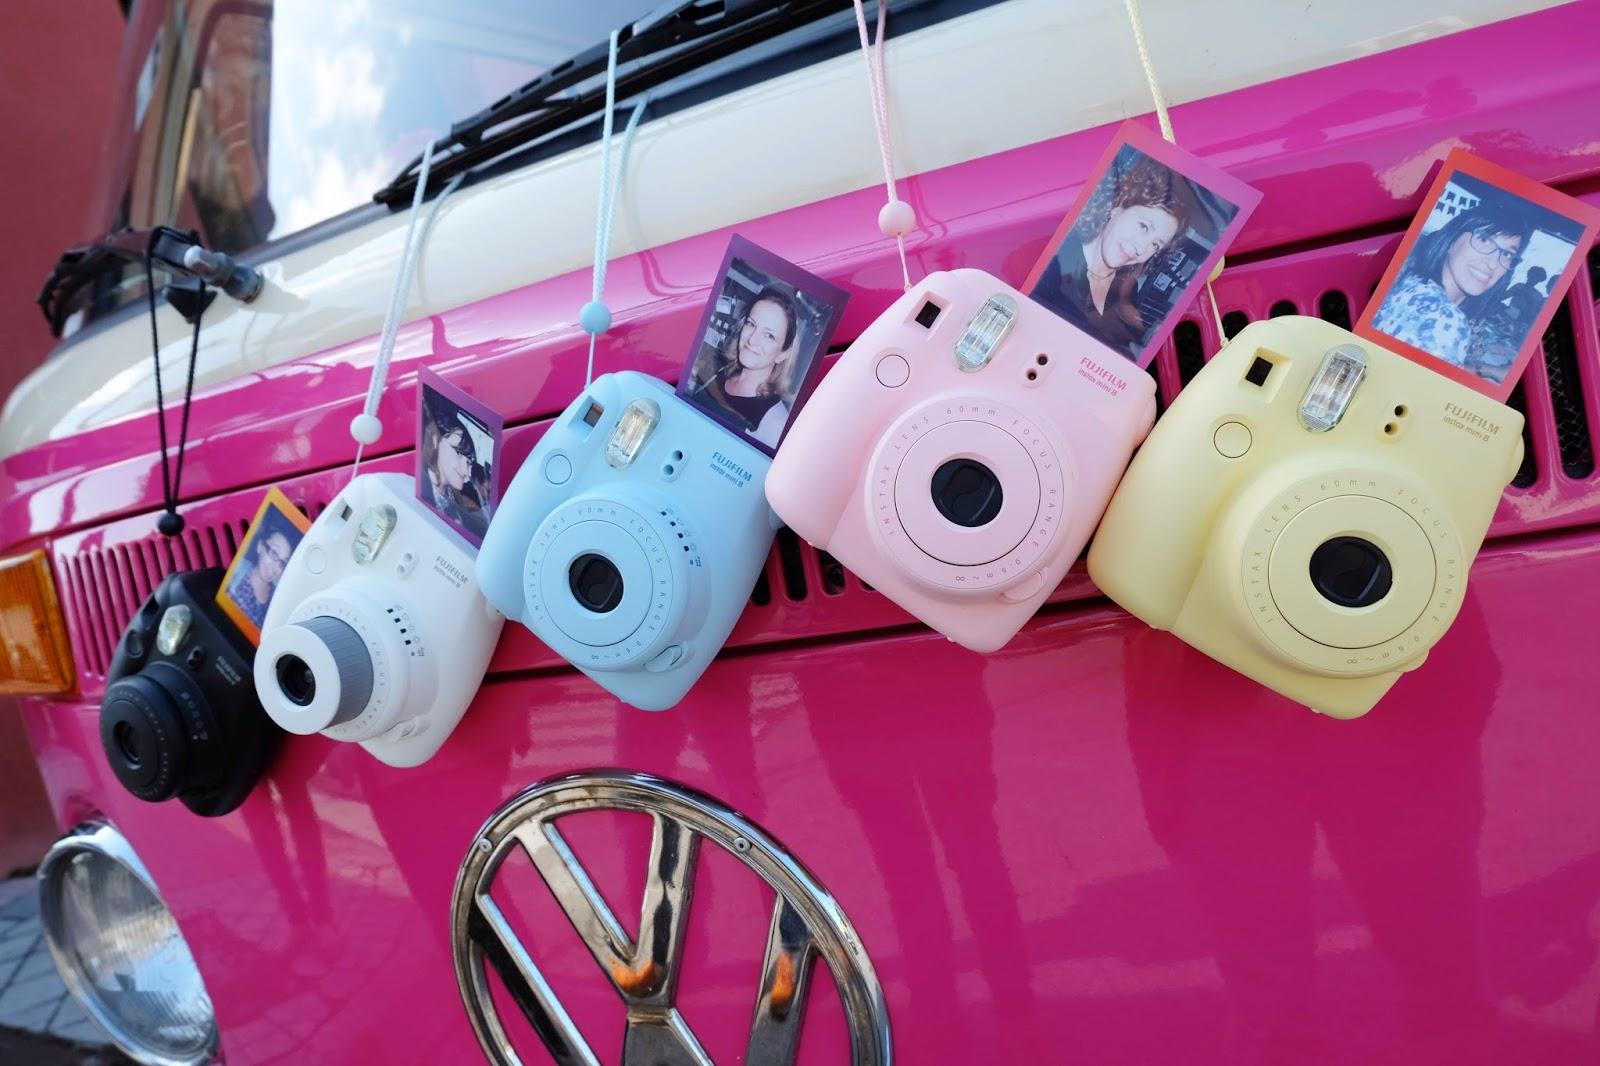 instax mini 8 fujifilm #instaxday Instax Day madrid blog bodas cámara fotos